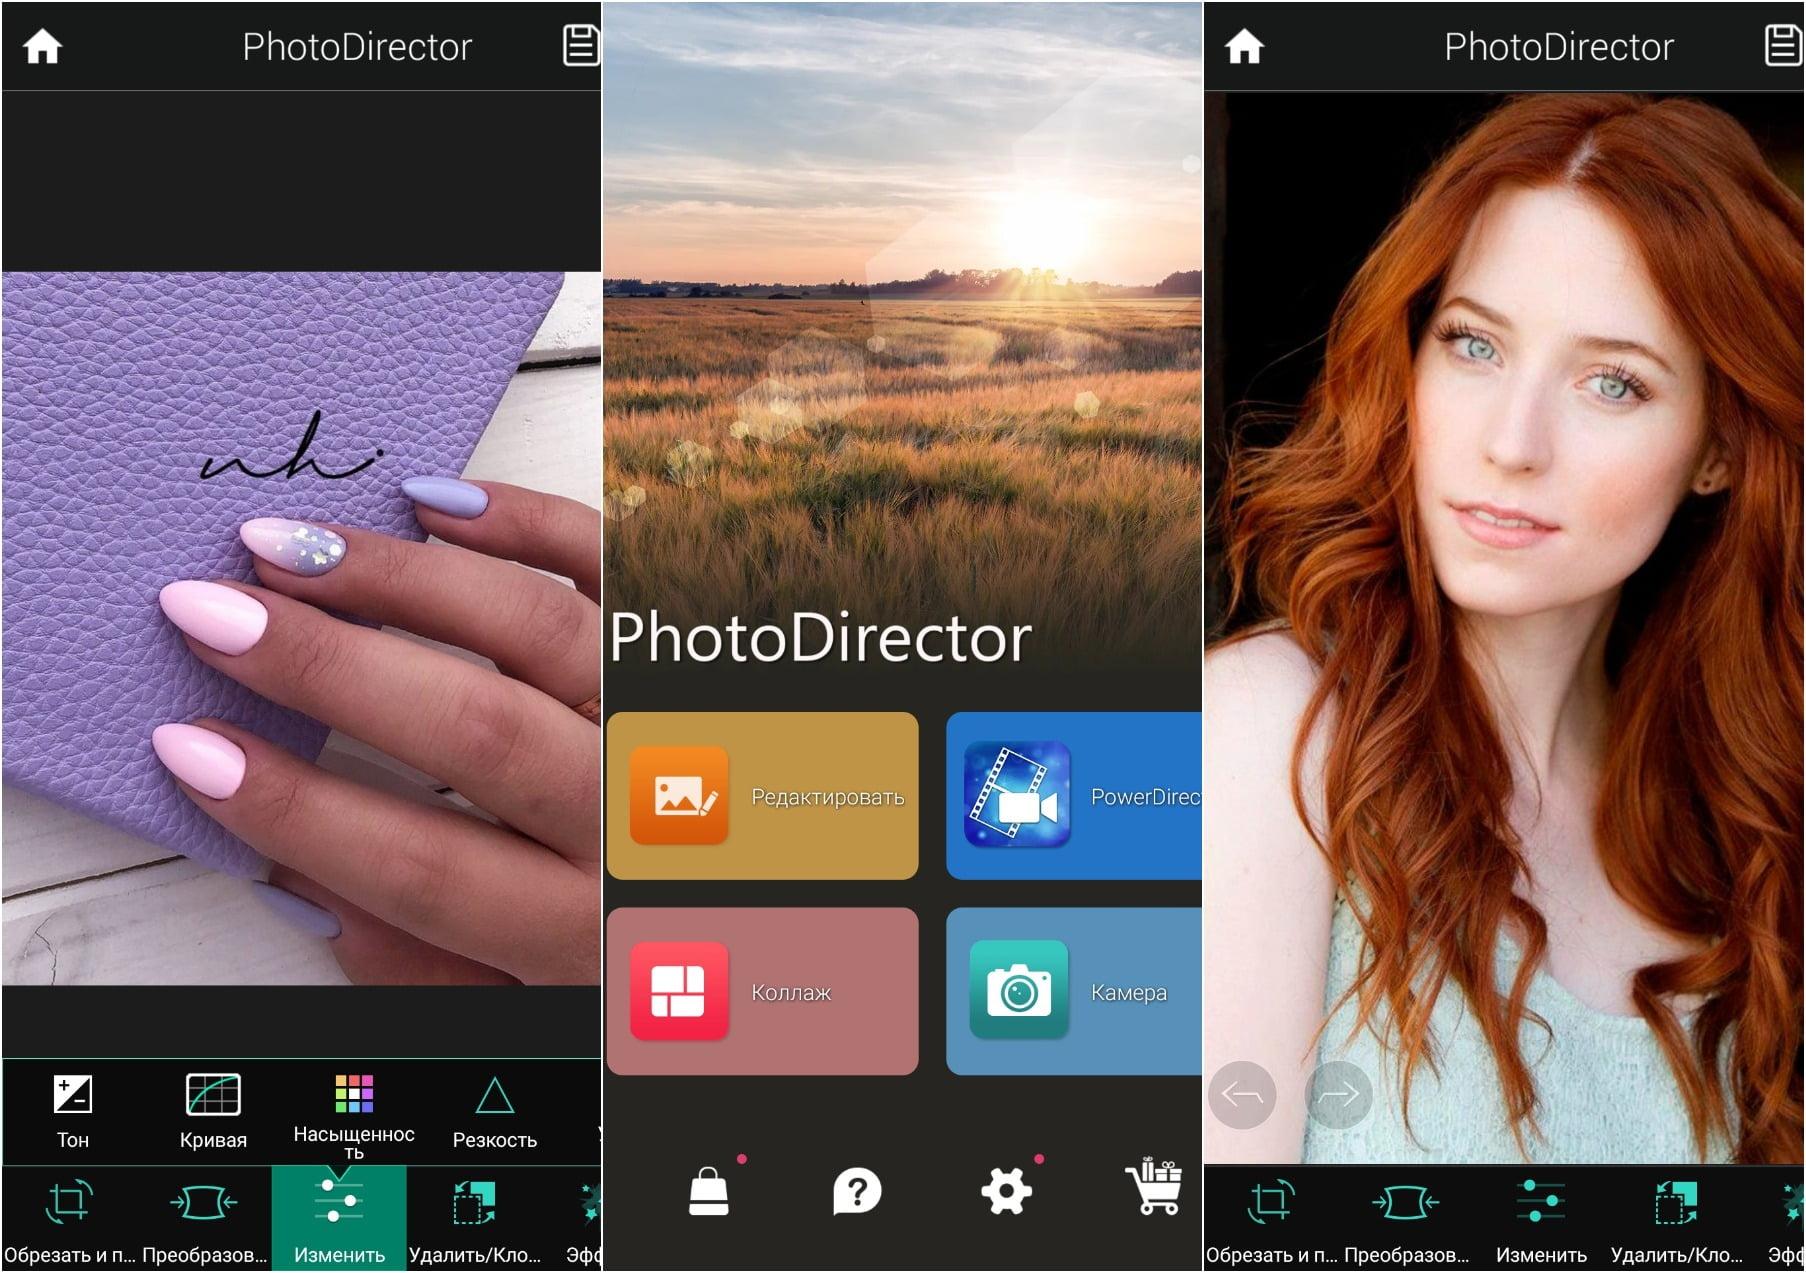 На фото приложение PhotoDirector